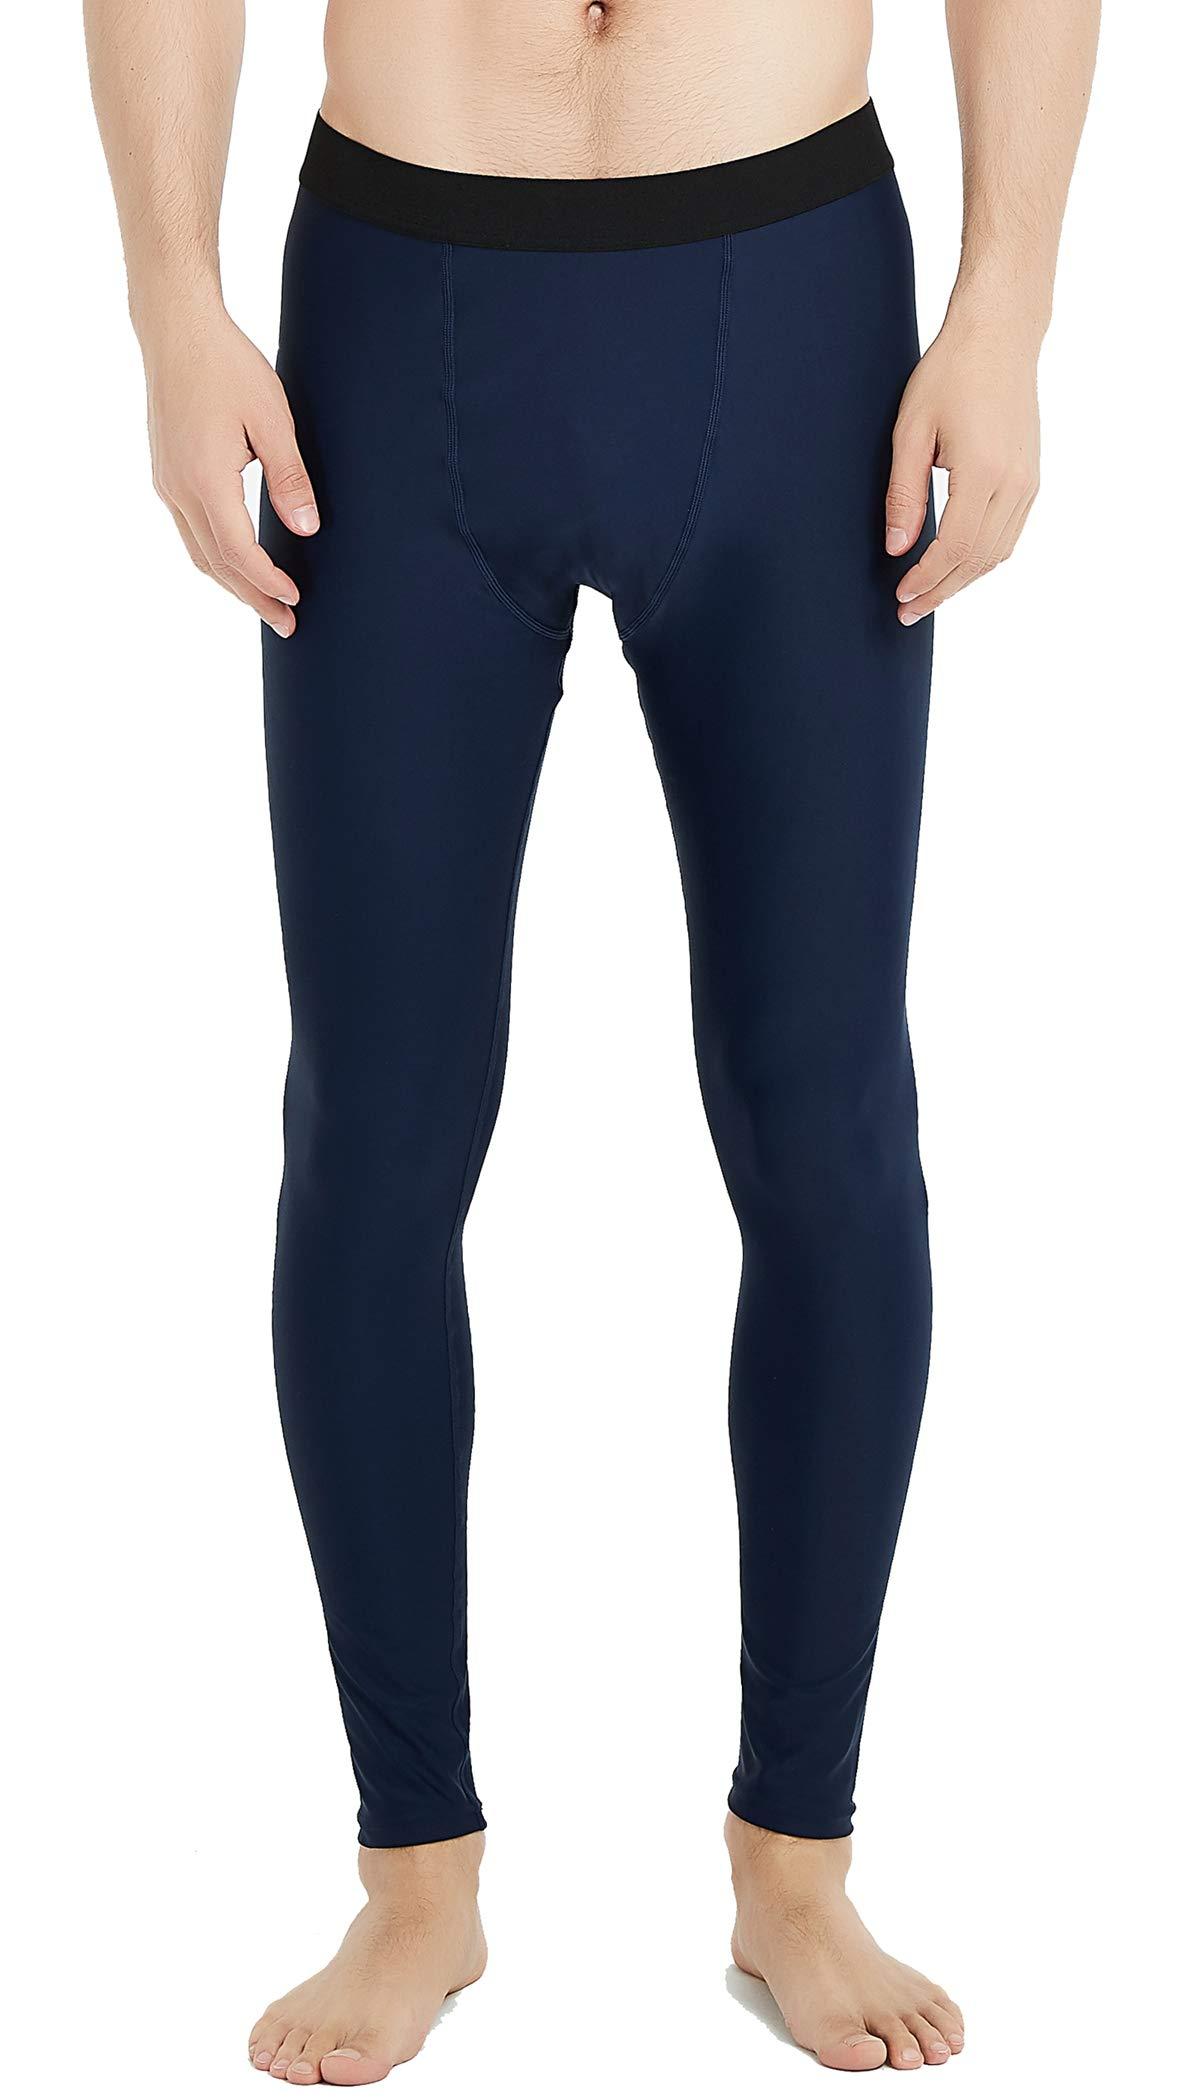 UPF 50+ Men's Surfing Leggings Sun Protection High-Waist Tummy Control Swimming Pants(6006navy-XL) by Lemorecn